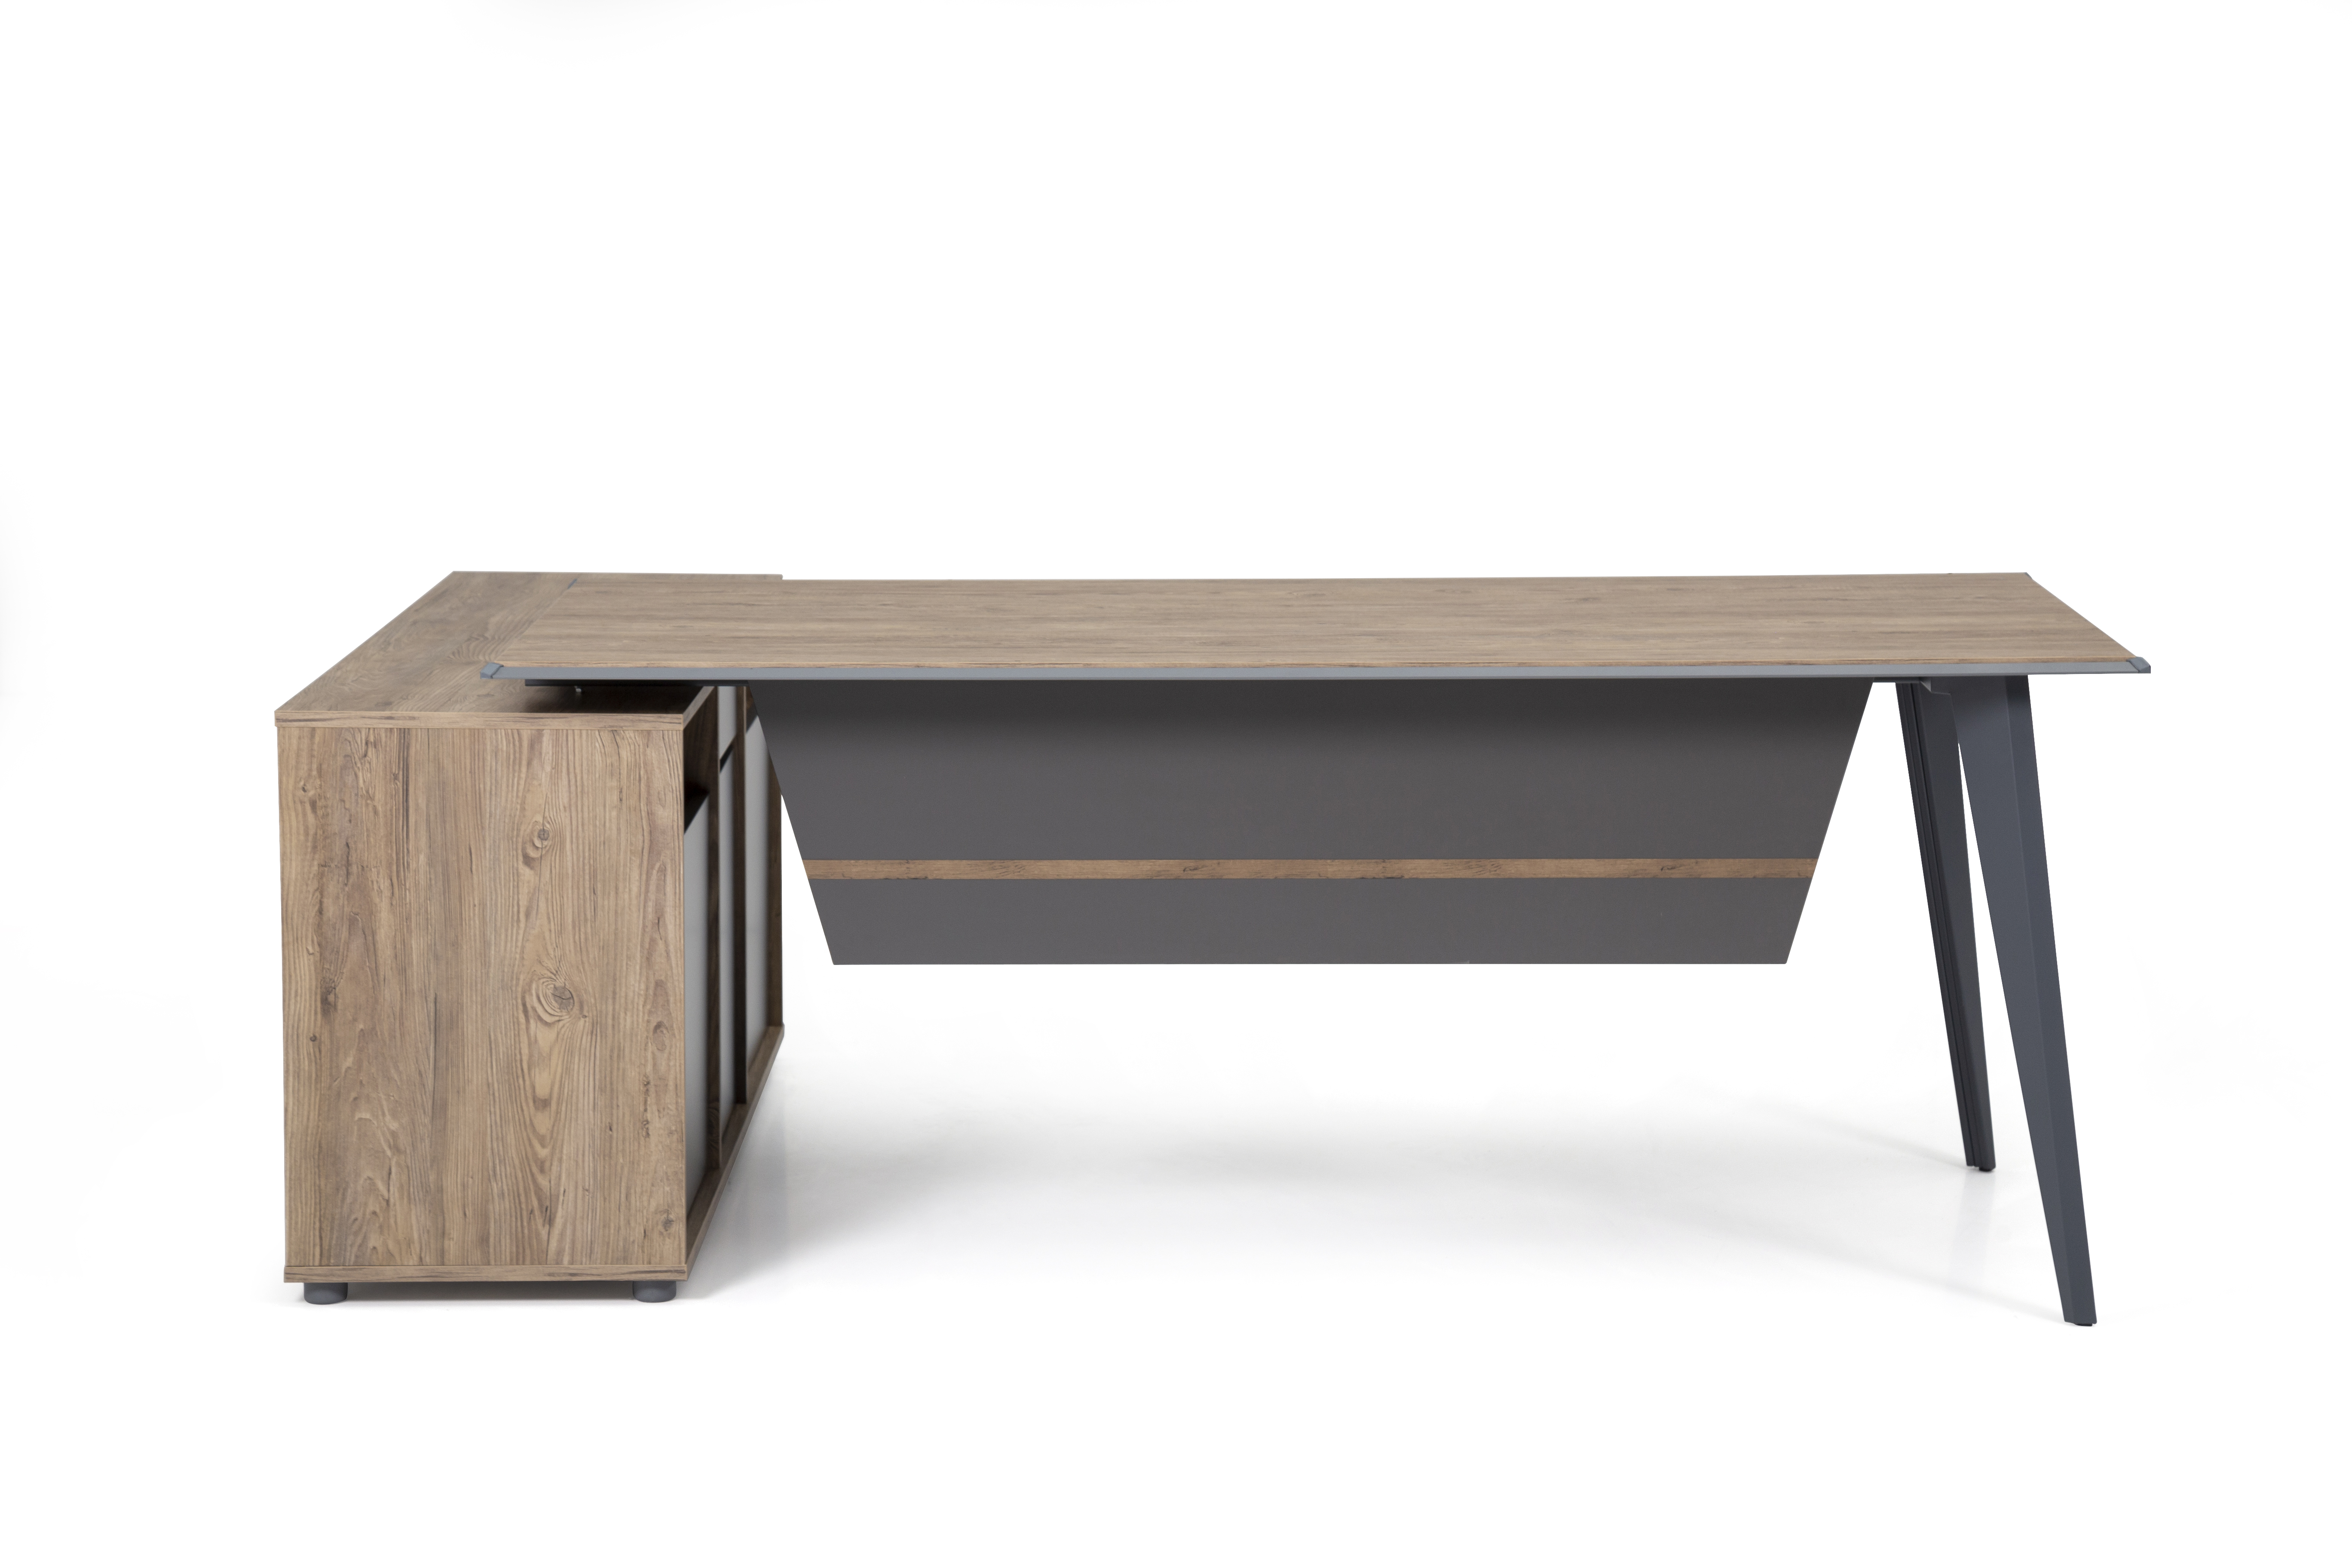 Ovali Design Bürotisch 2-teilig Ecoplus L2 140x80 cm